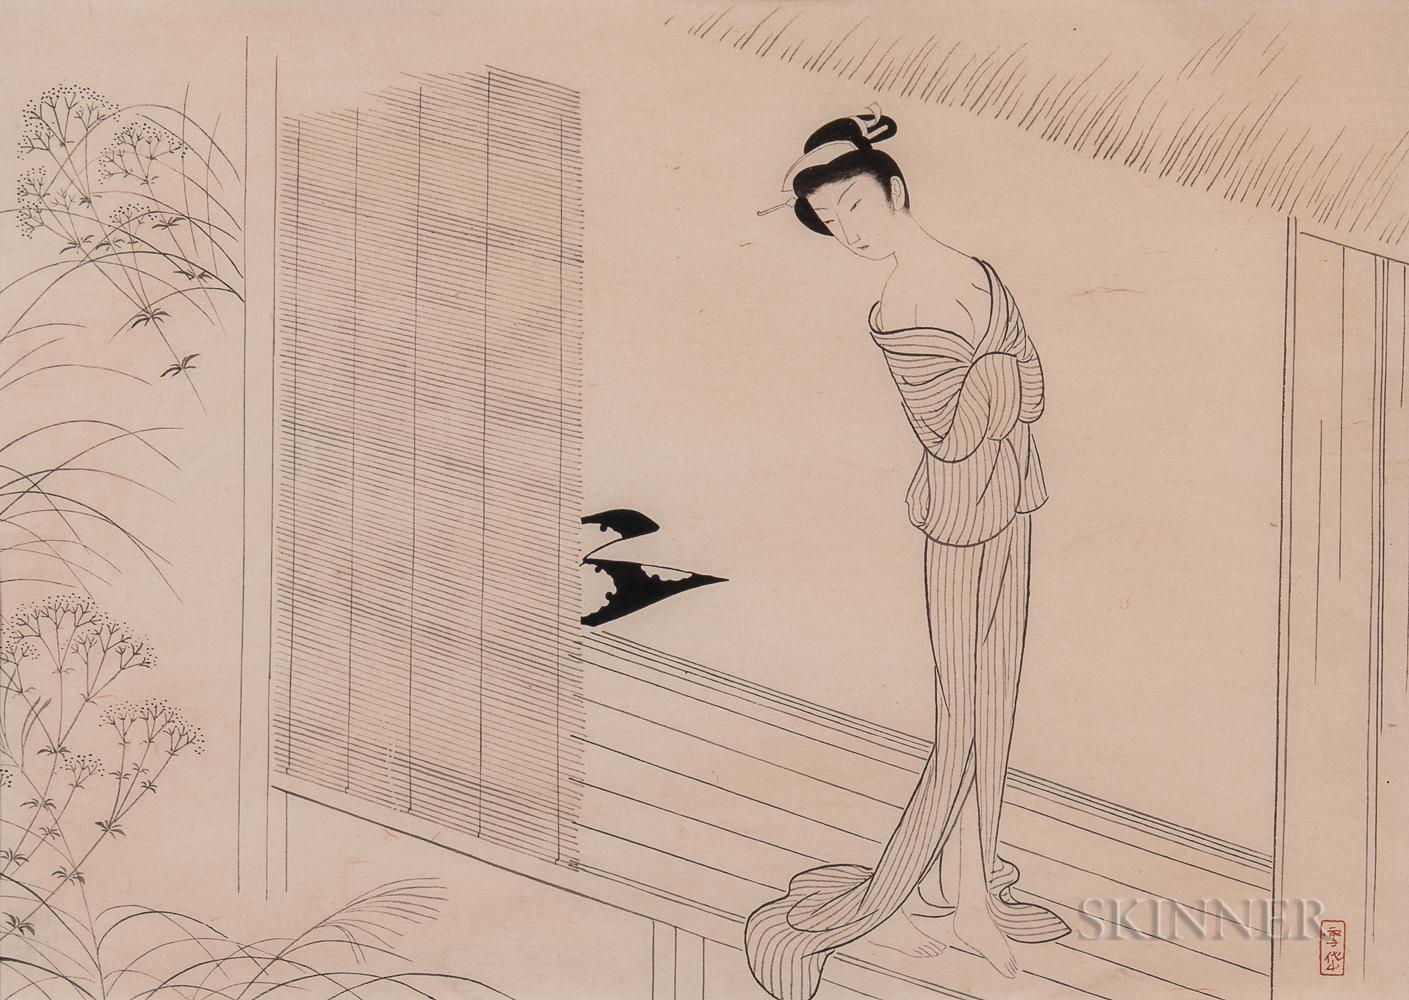 Settai Komura (1887-1940) Ink Woodblock Print